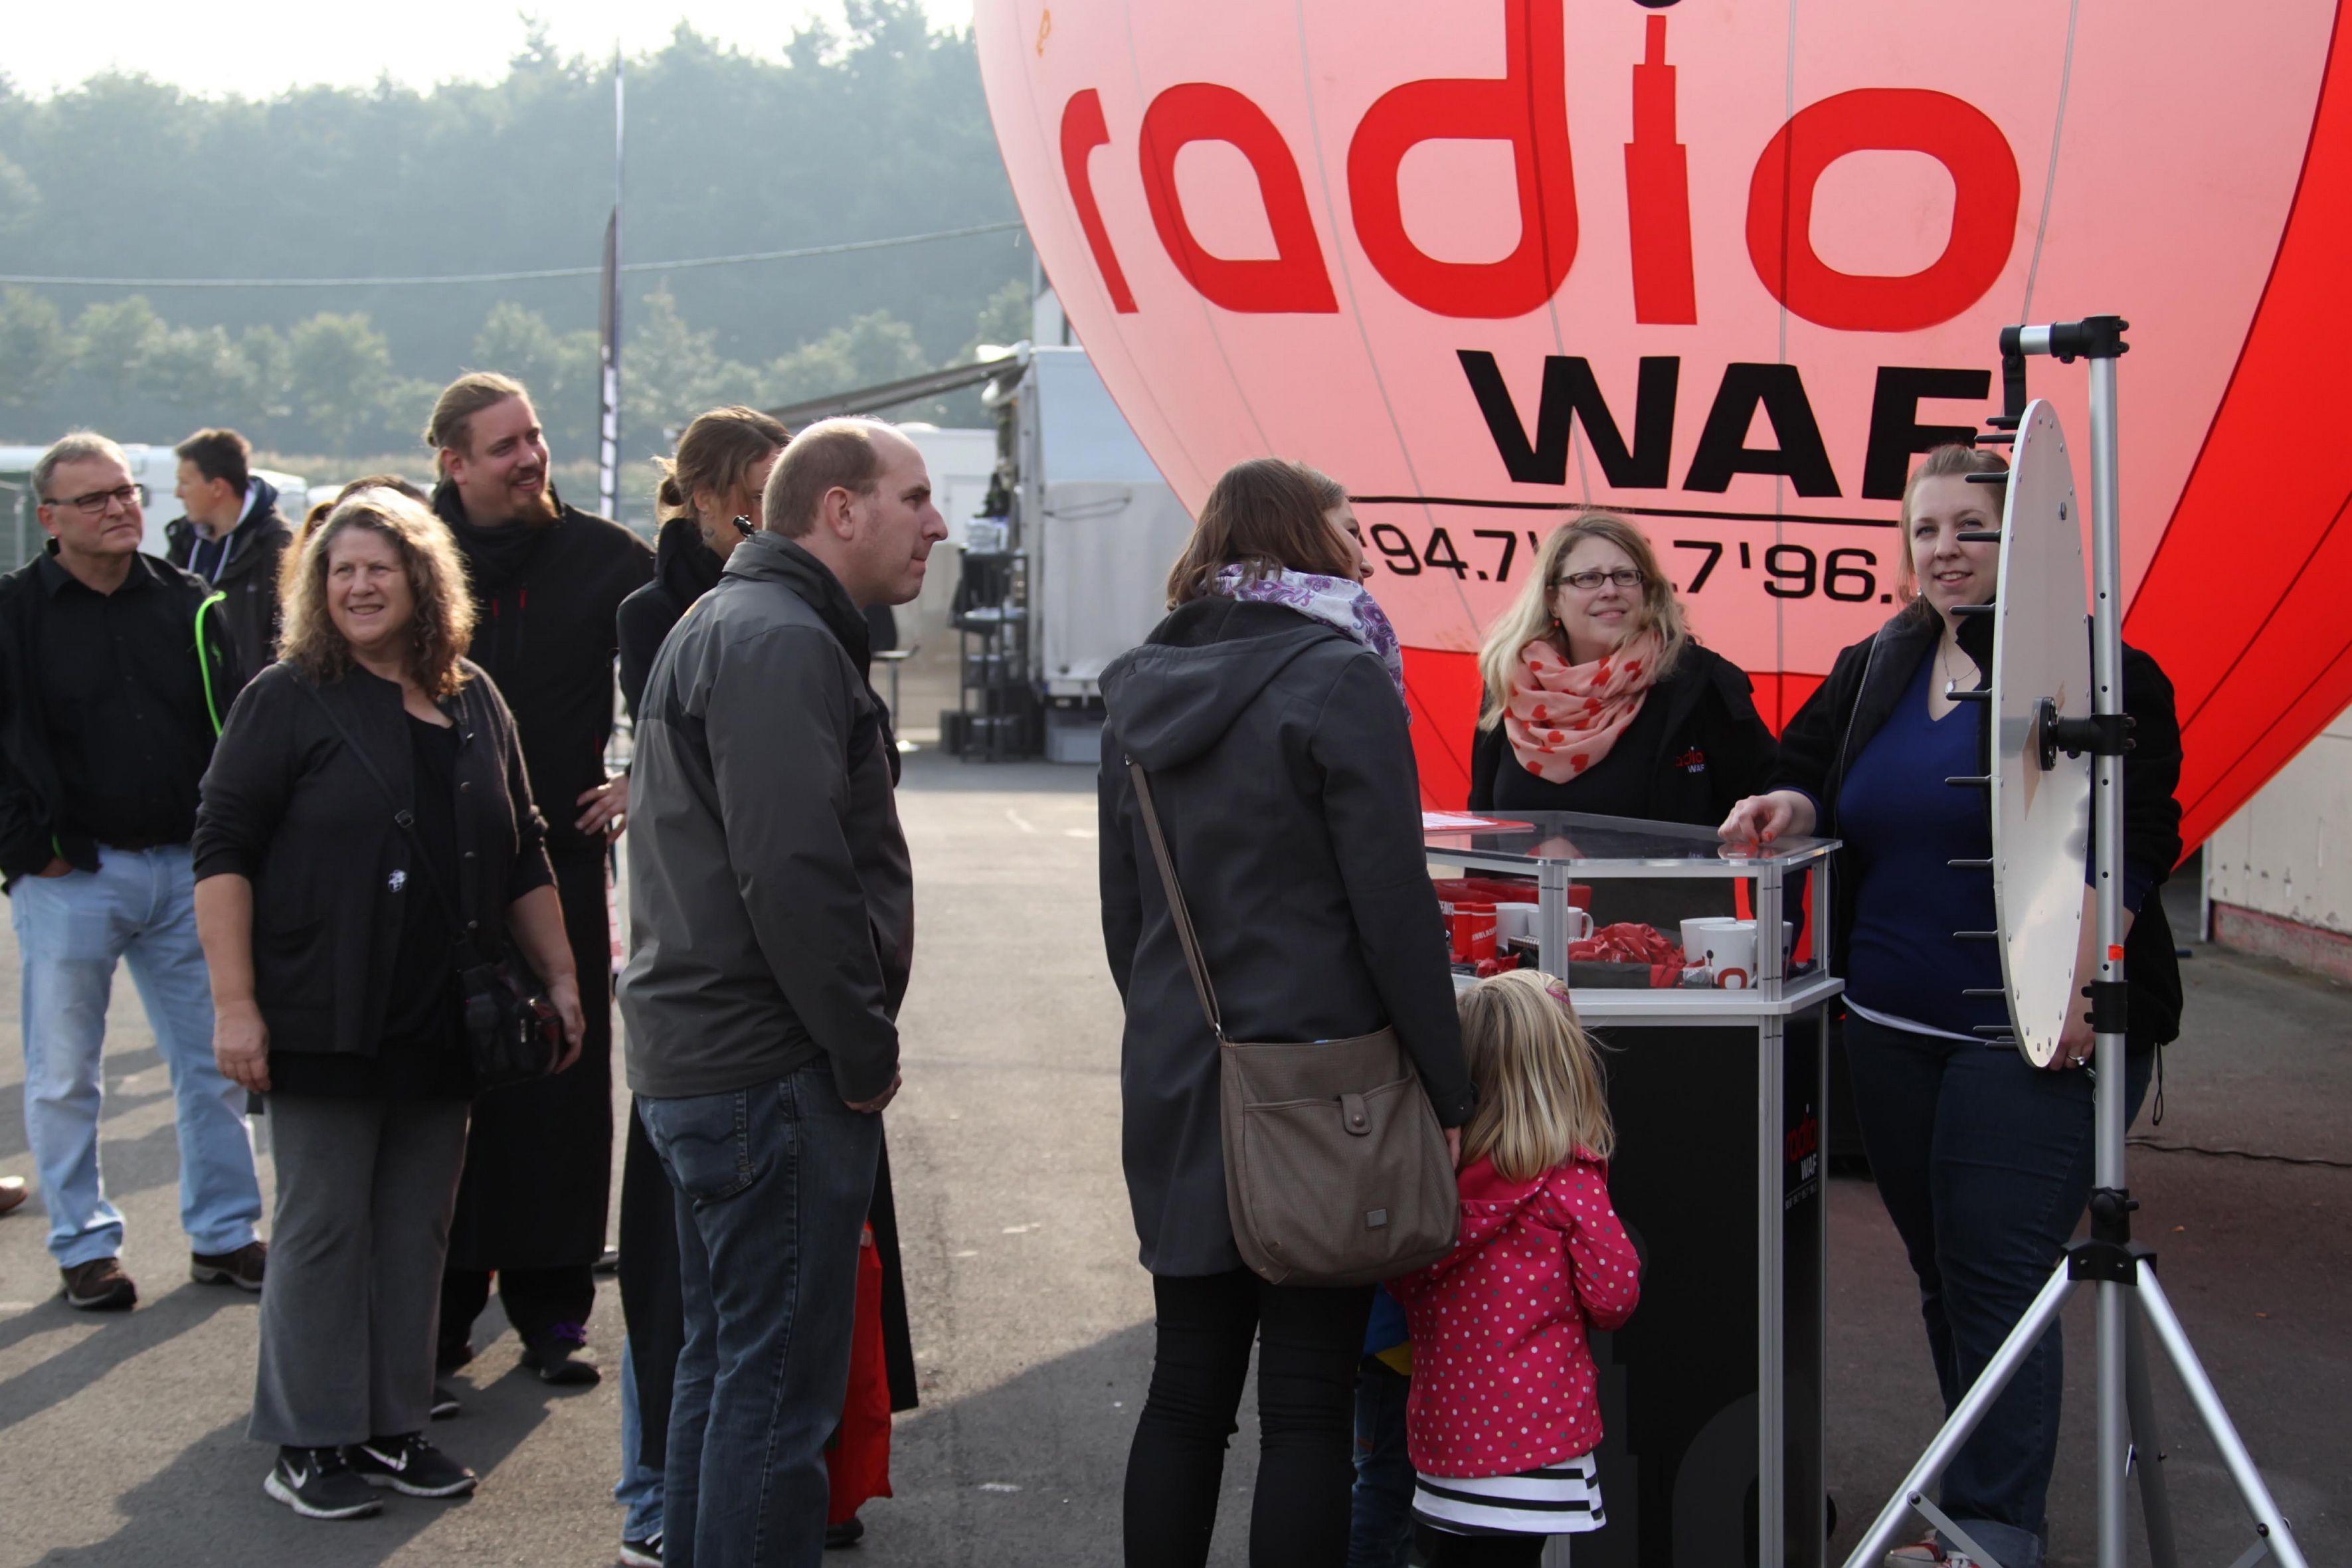 Radio Waf Polizeibericht